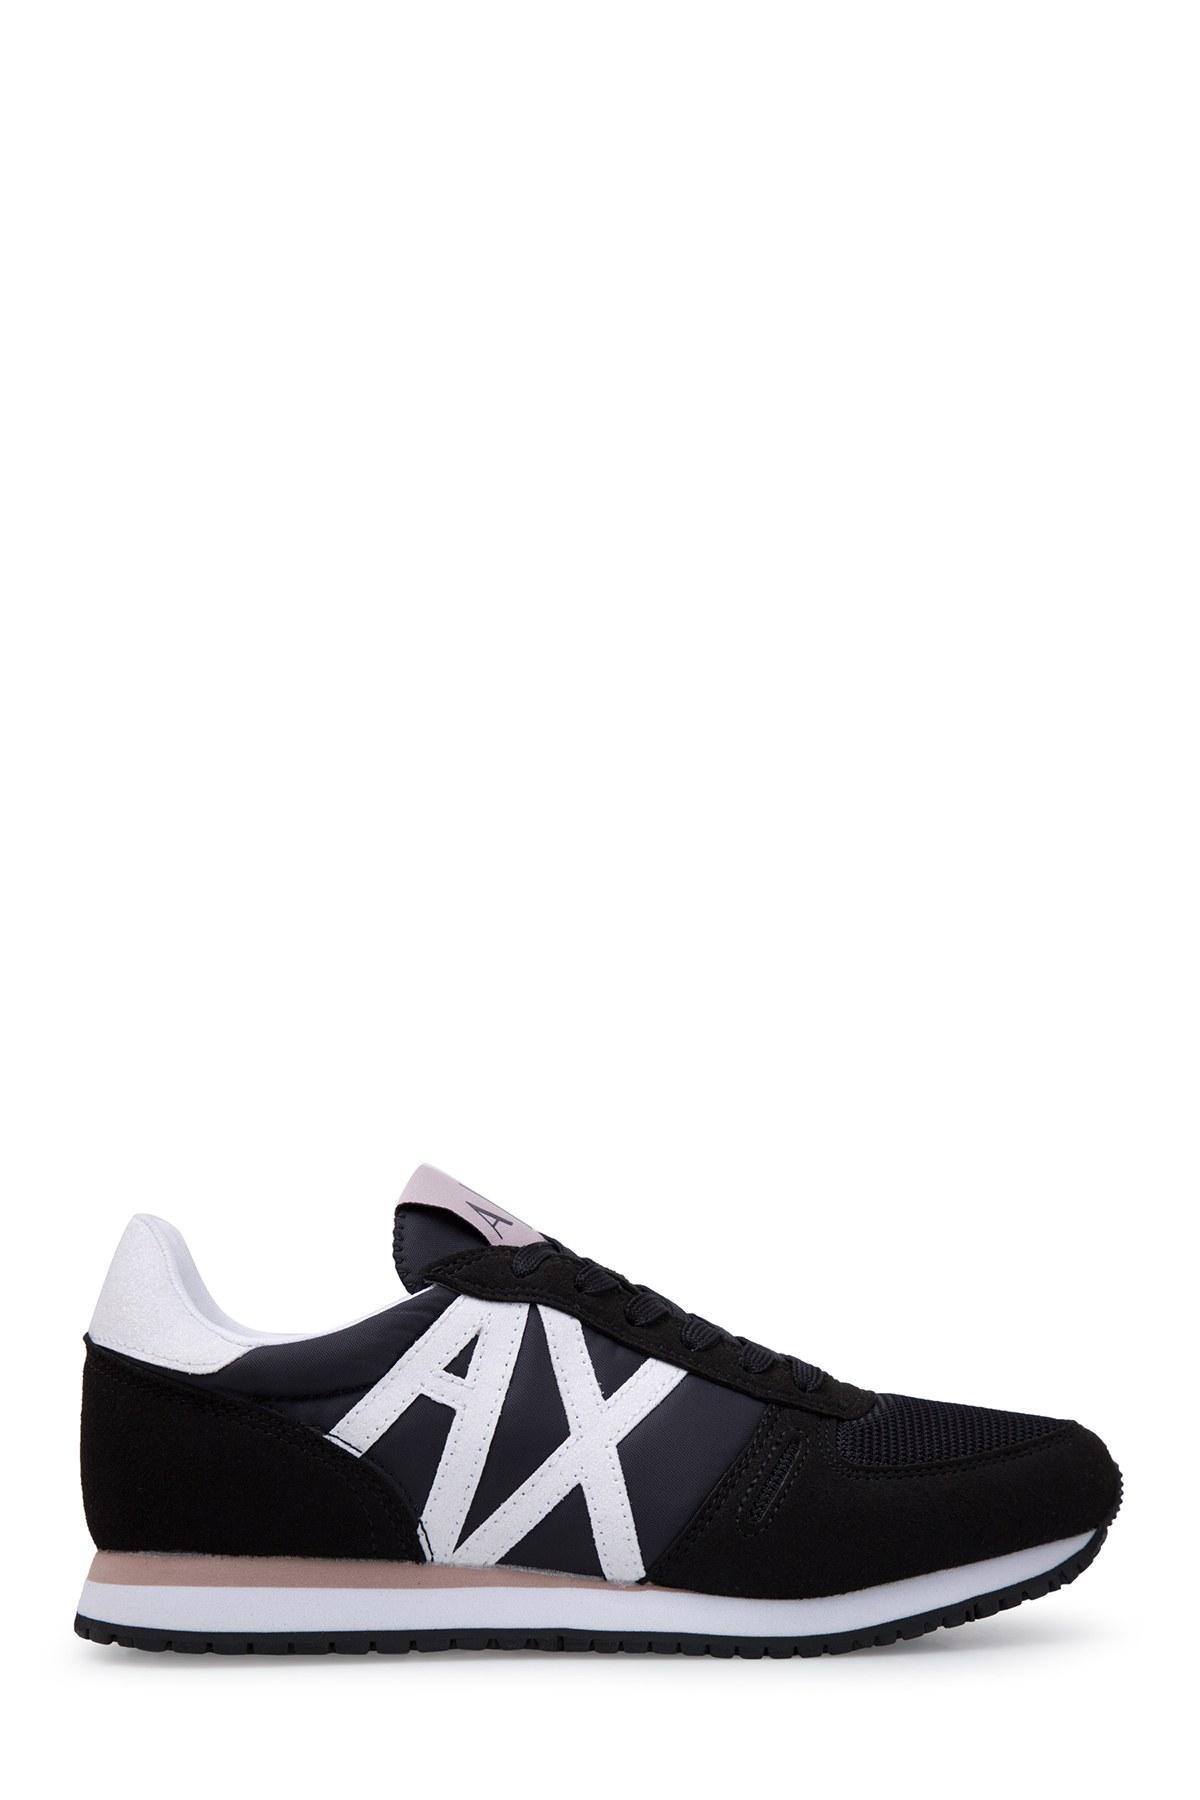 Armani Exchange Kadın Ayakkabı XDX031 XV308 A120 SİYAH